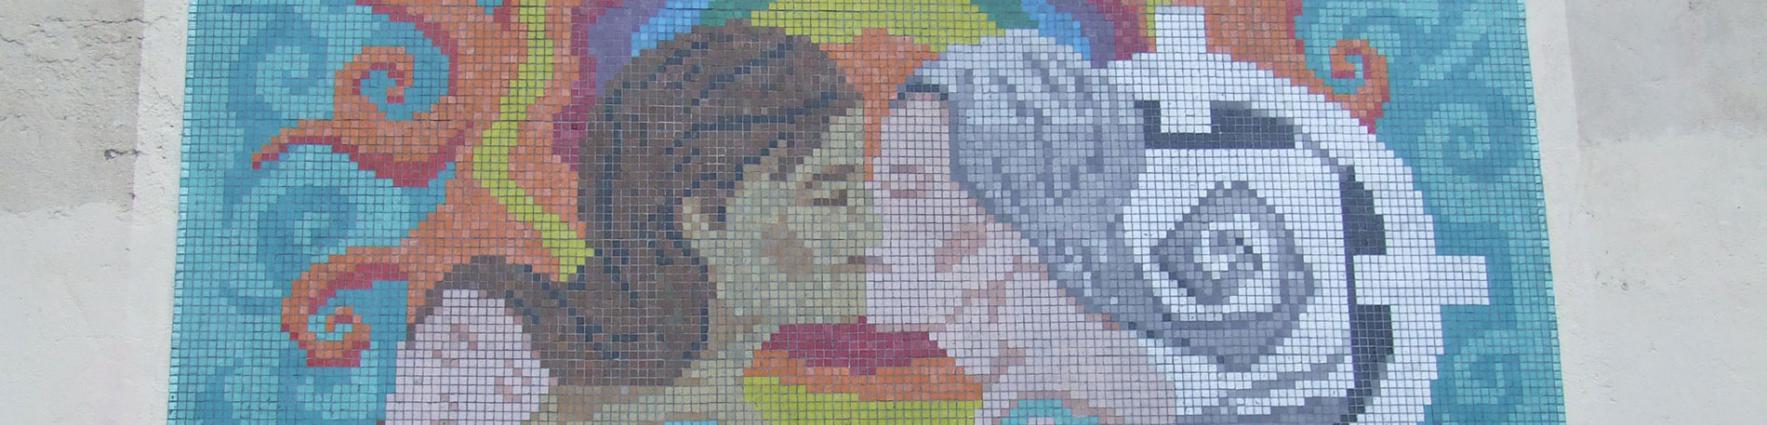 Mural Rosario libre de lesbofobia